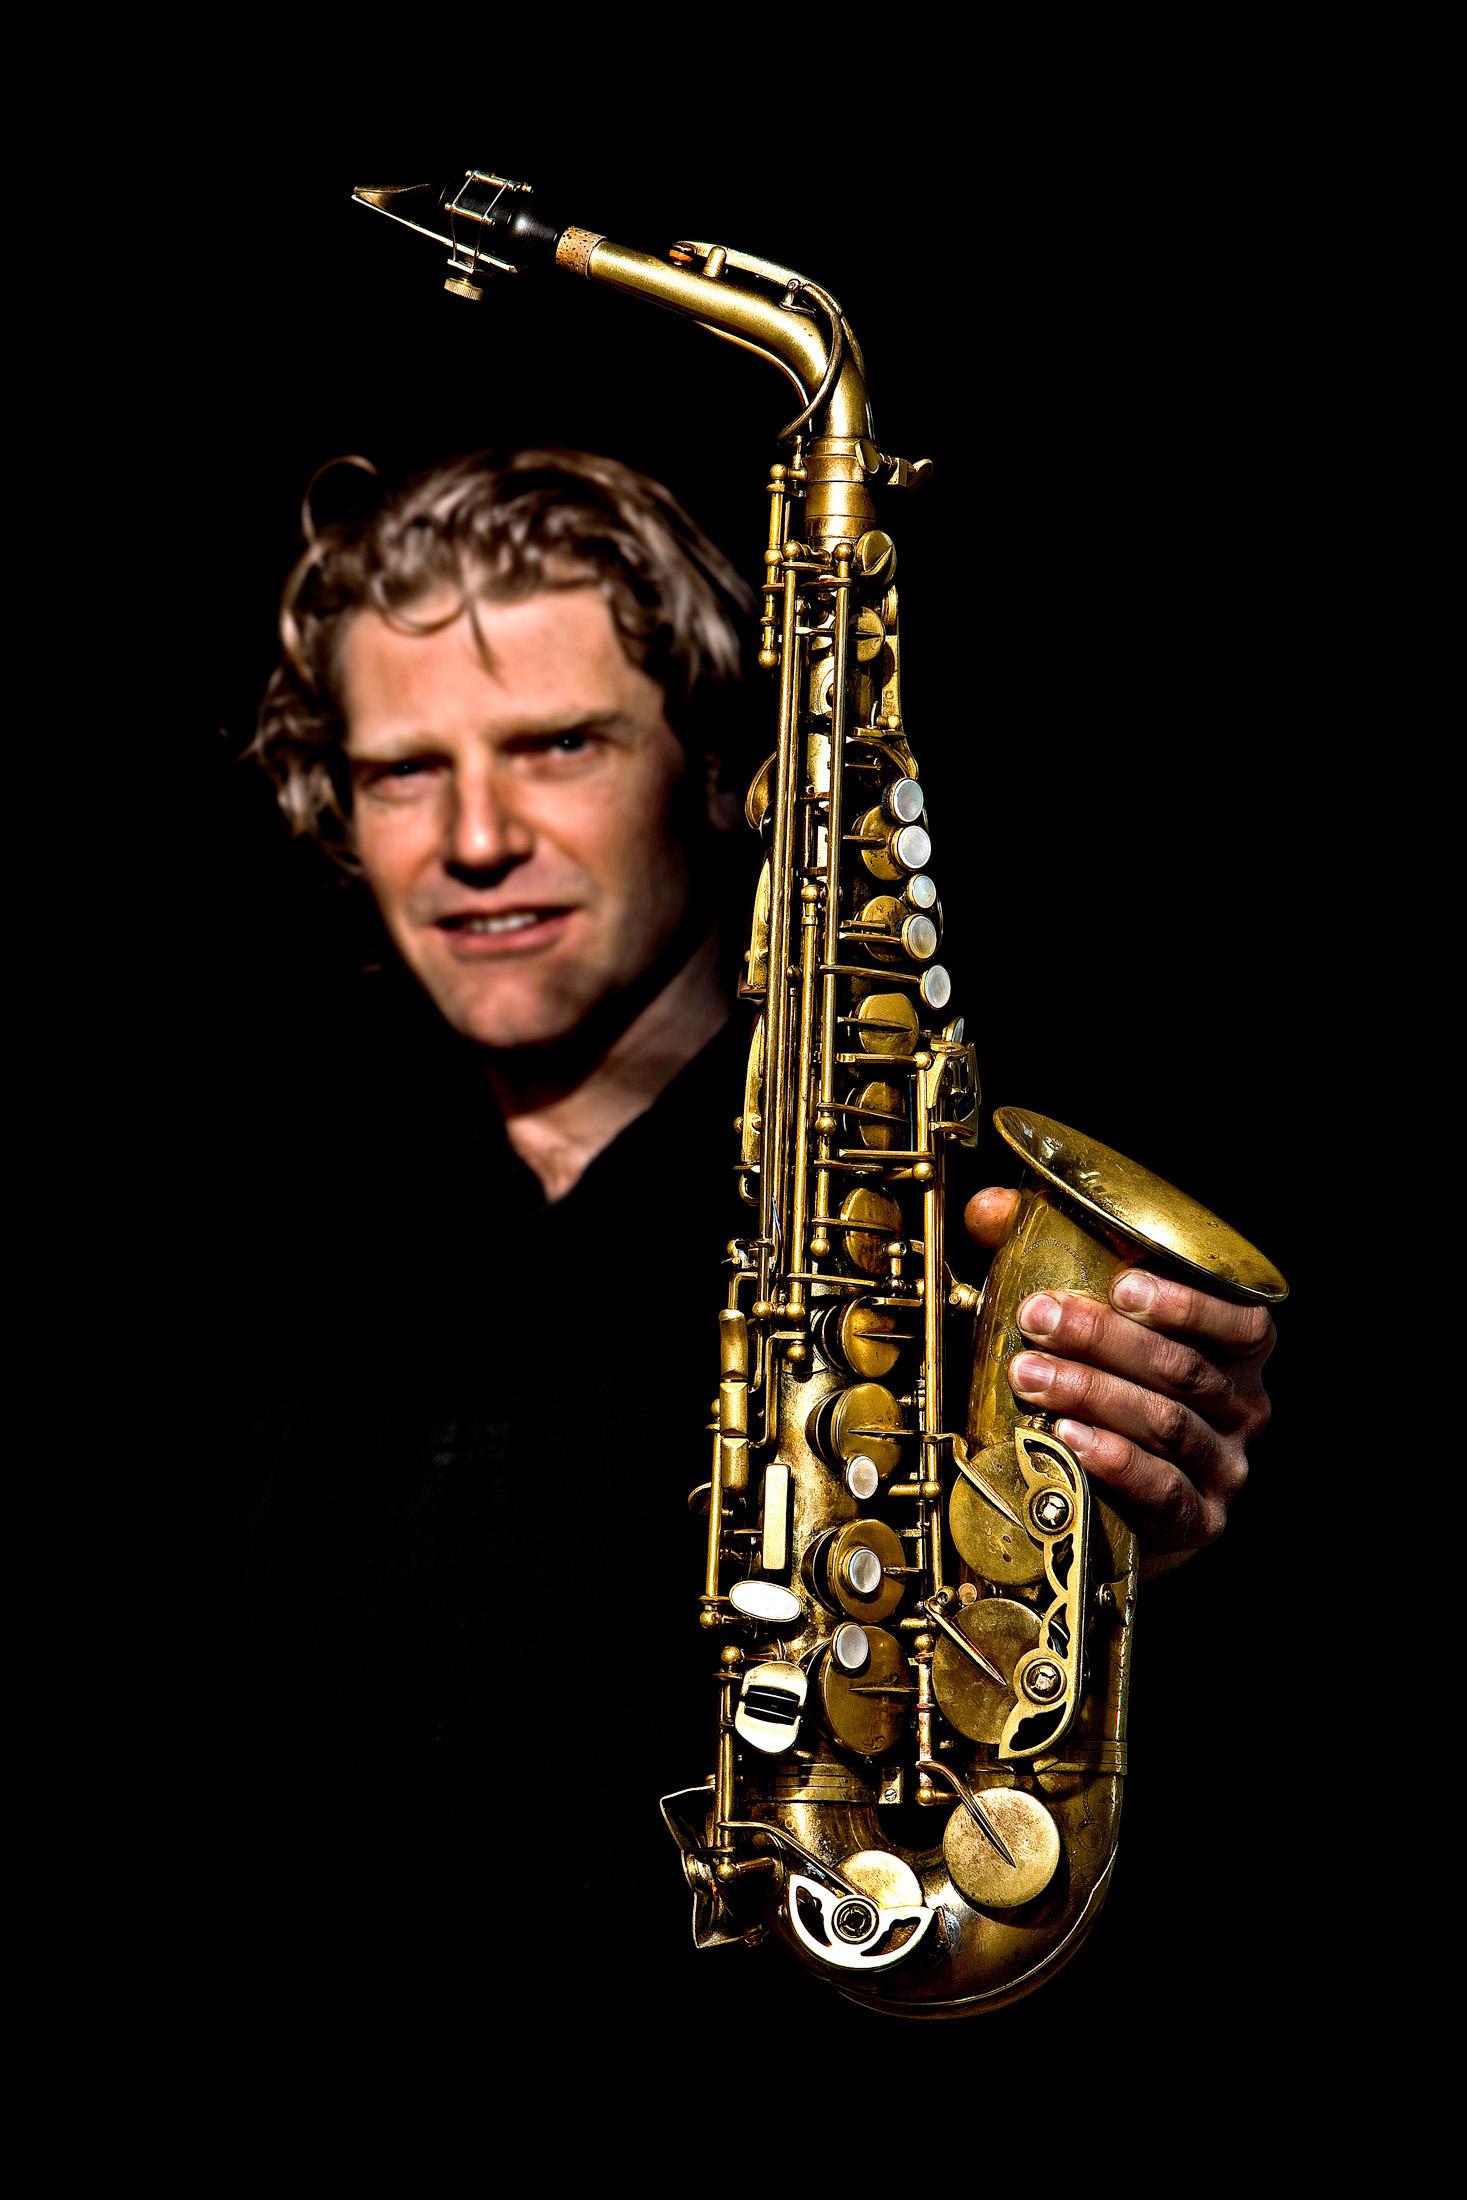 Friso holding Free Wind Alto saxophone